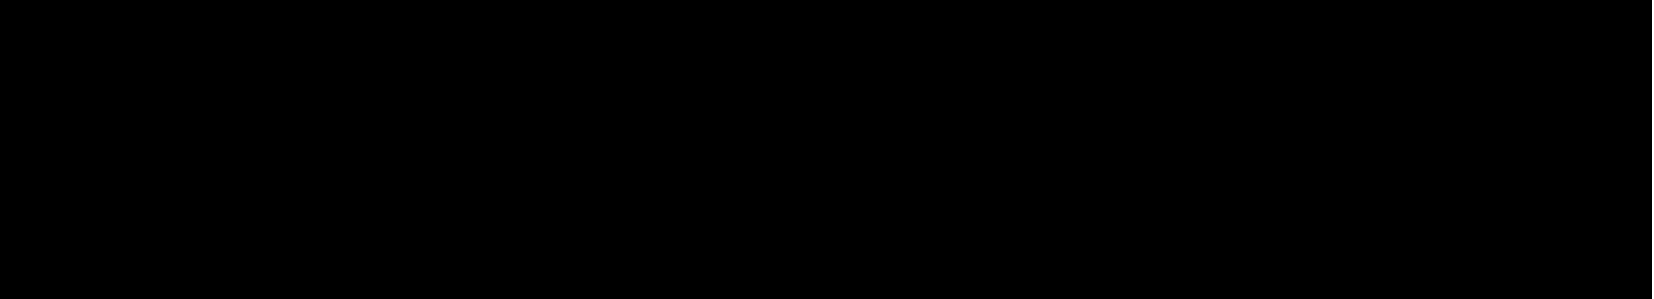 logo arima hotel